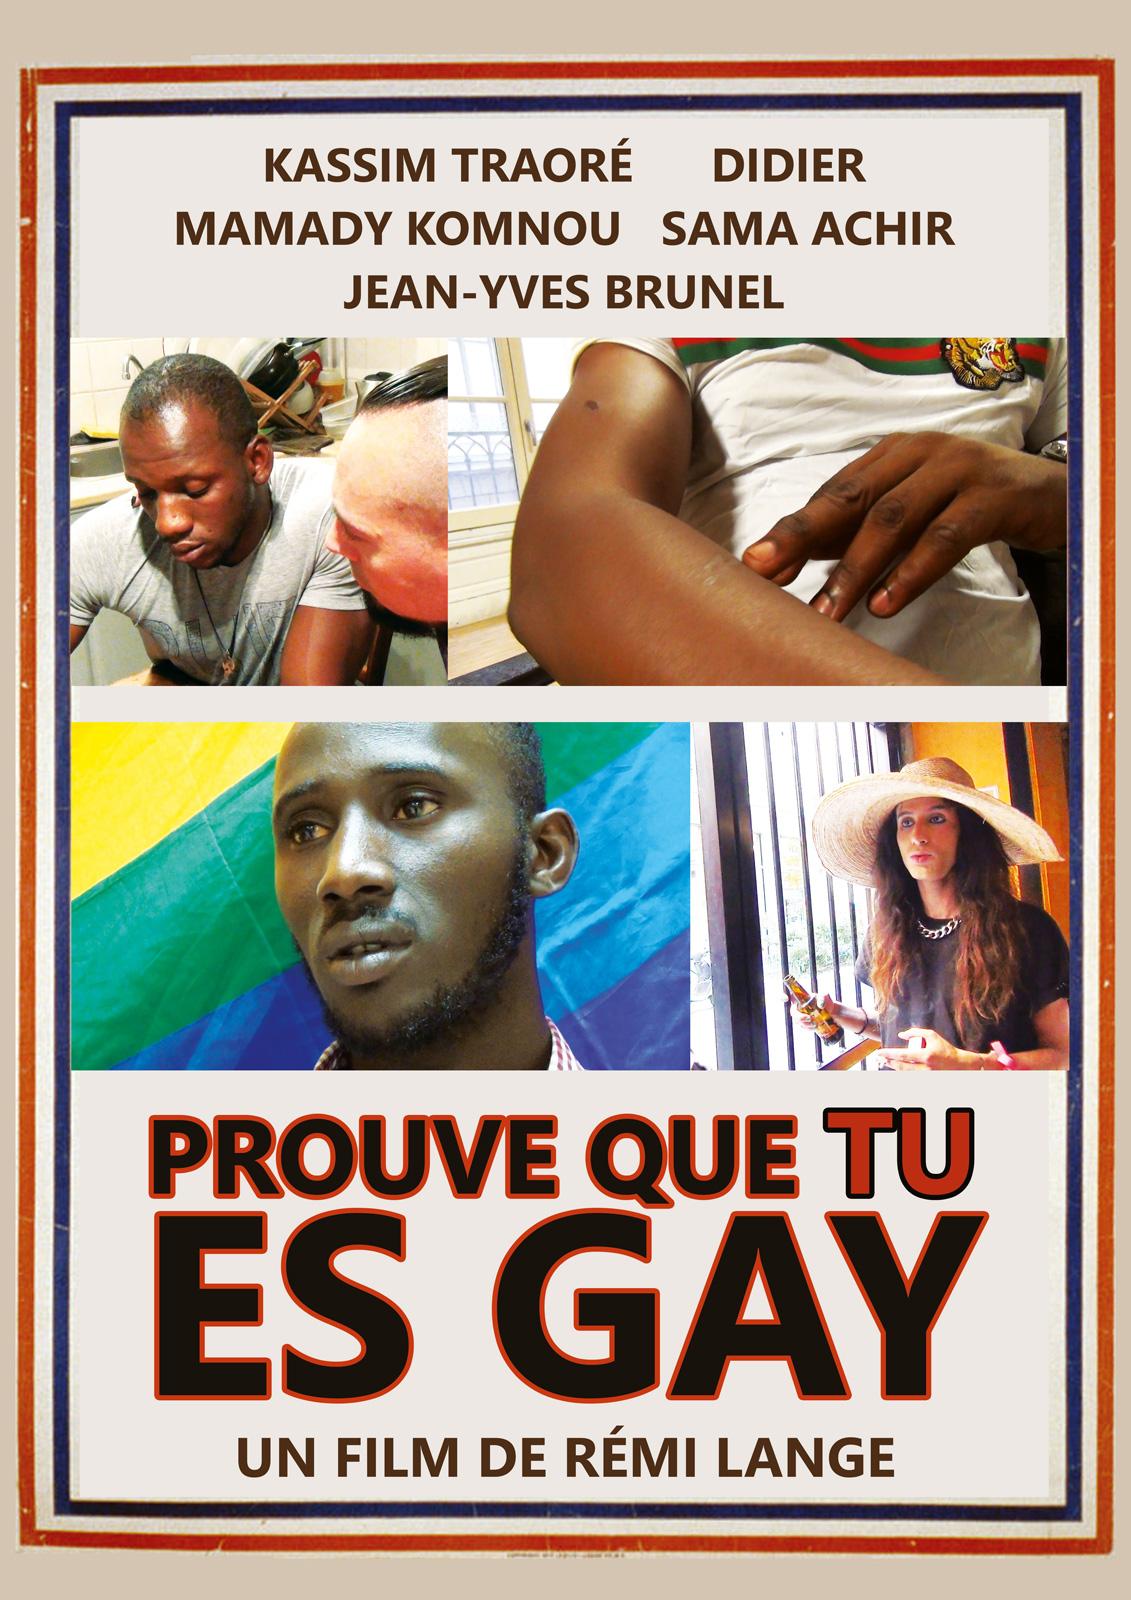 Image du film Prouve que tu es gay